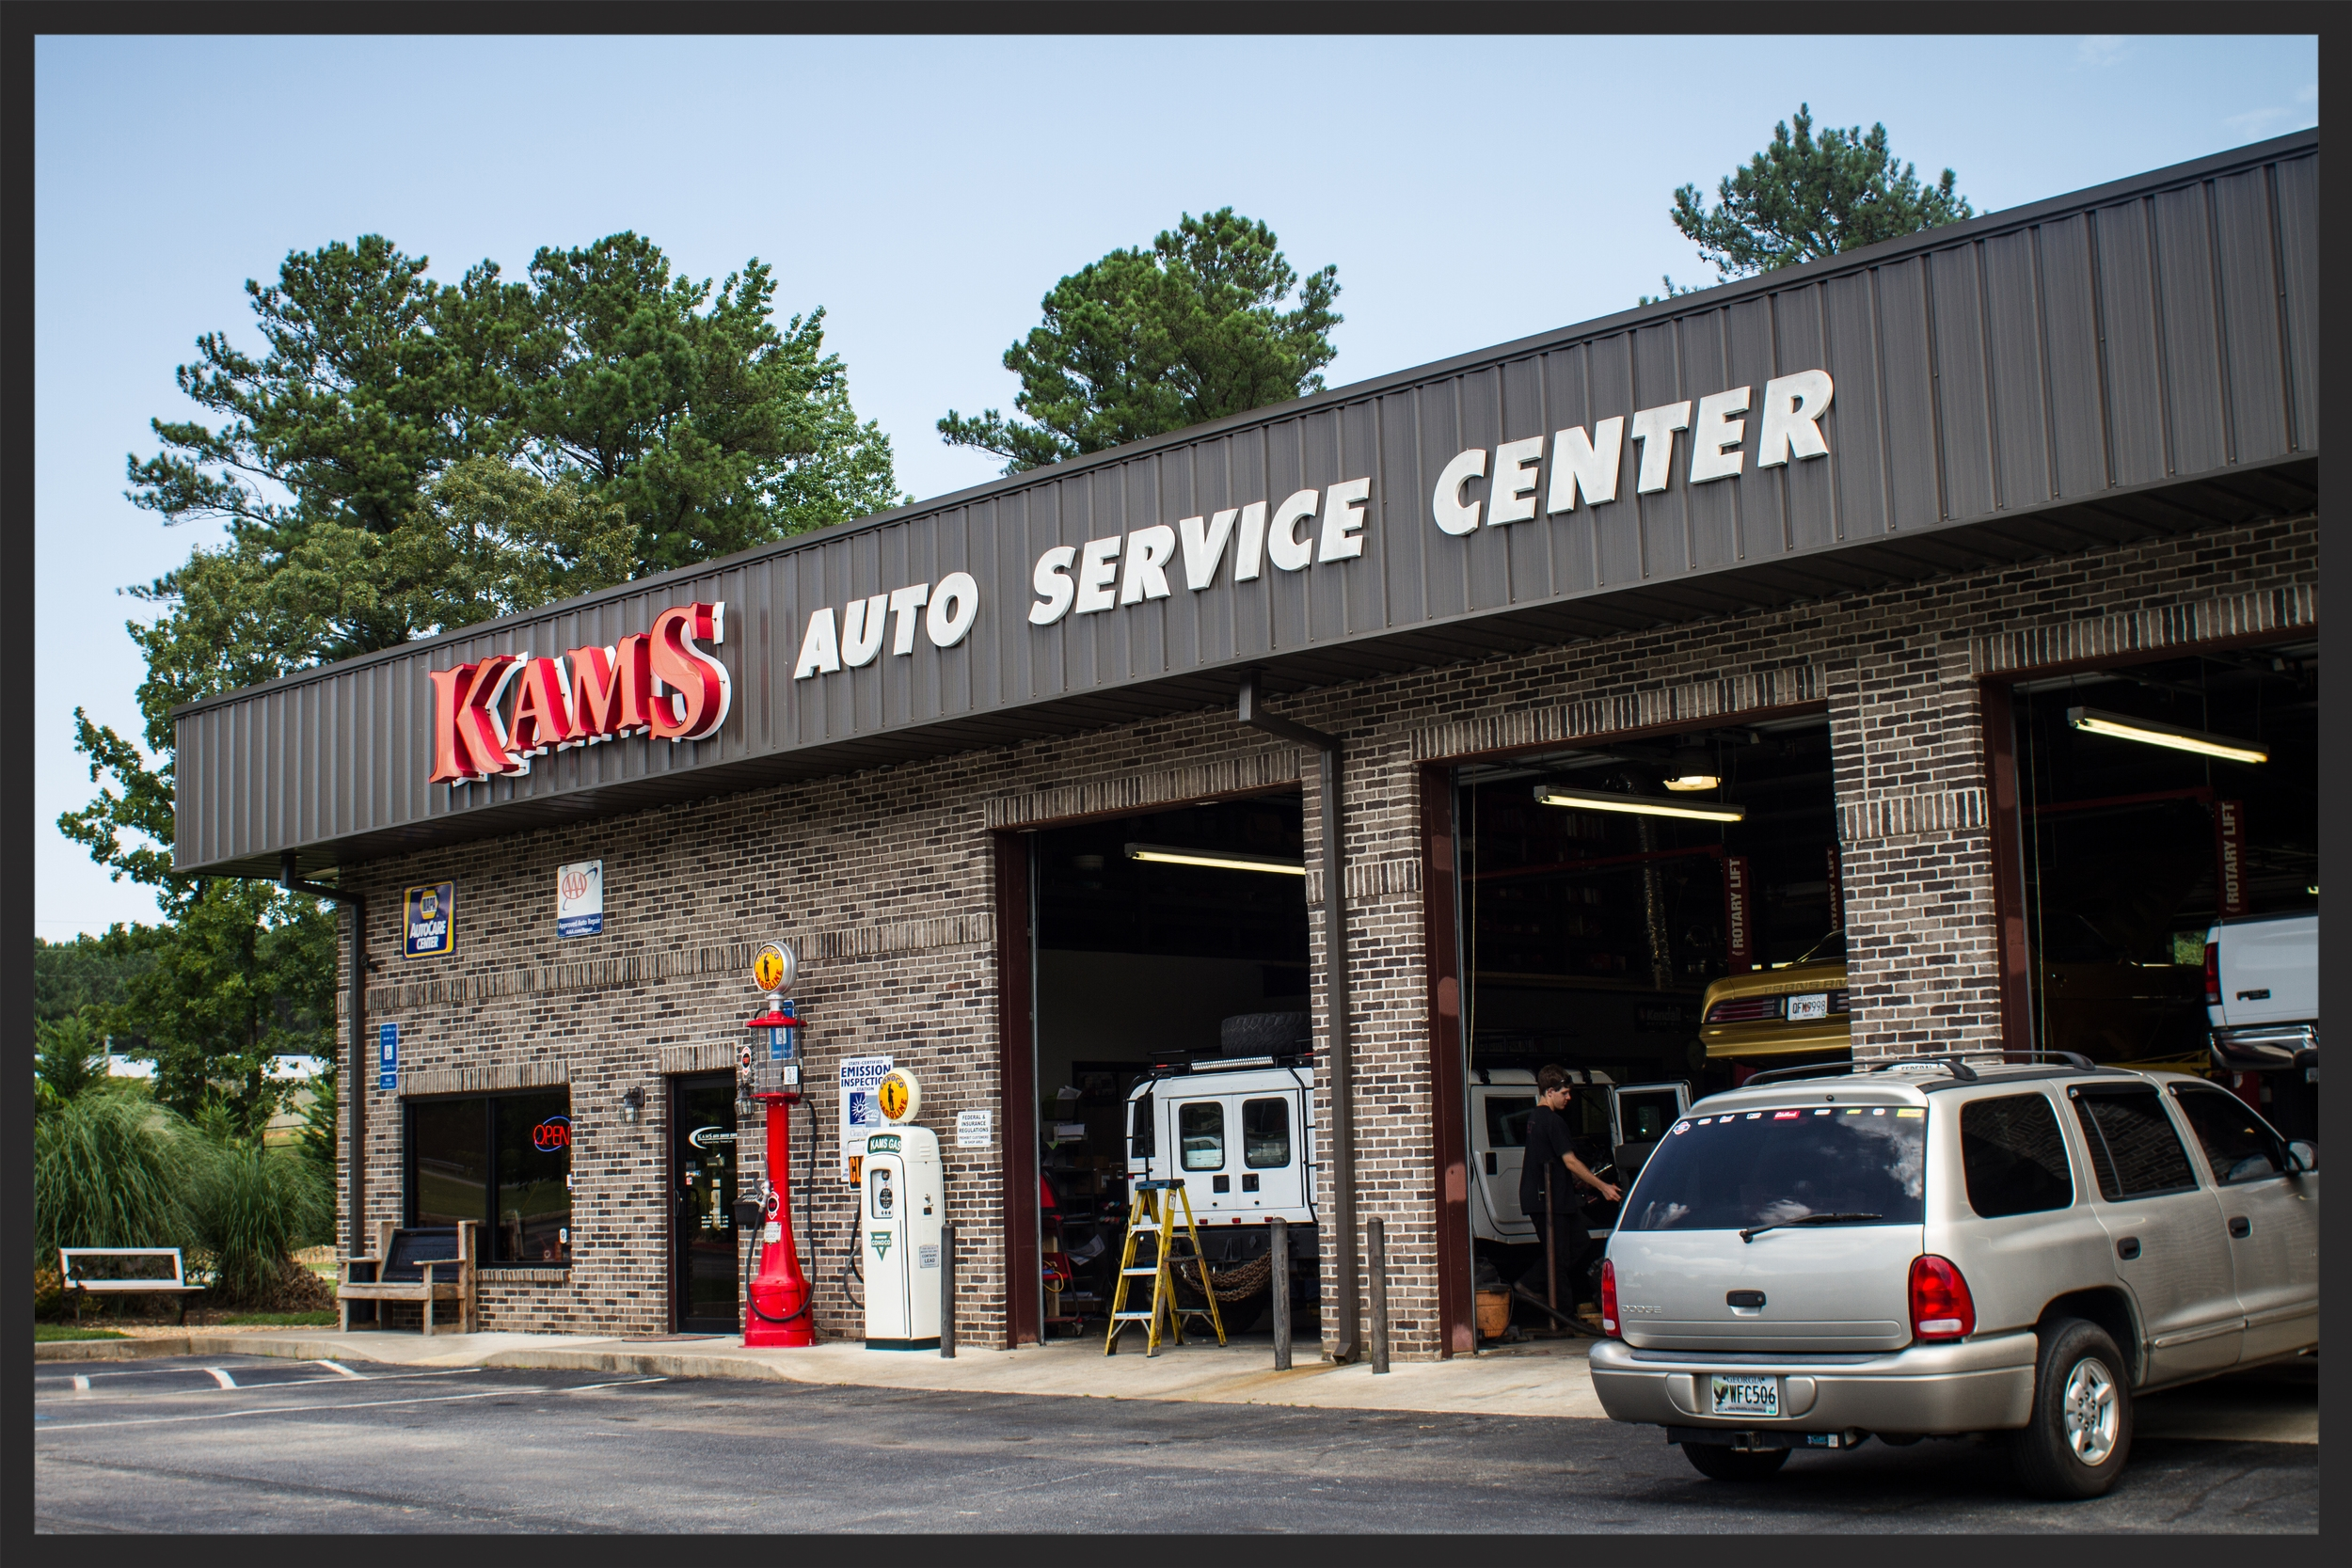 Kam's Auto Service Center 07.13.2016-24 PS.jpg